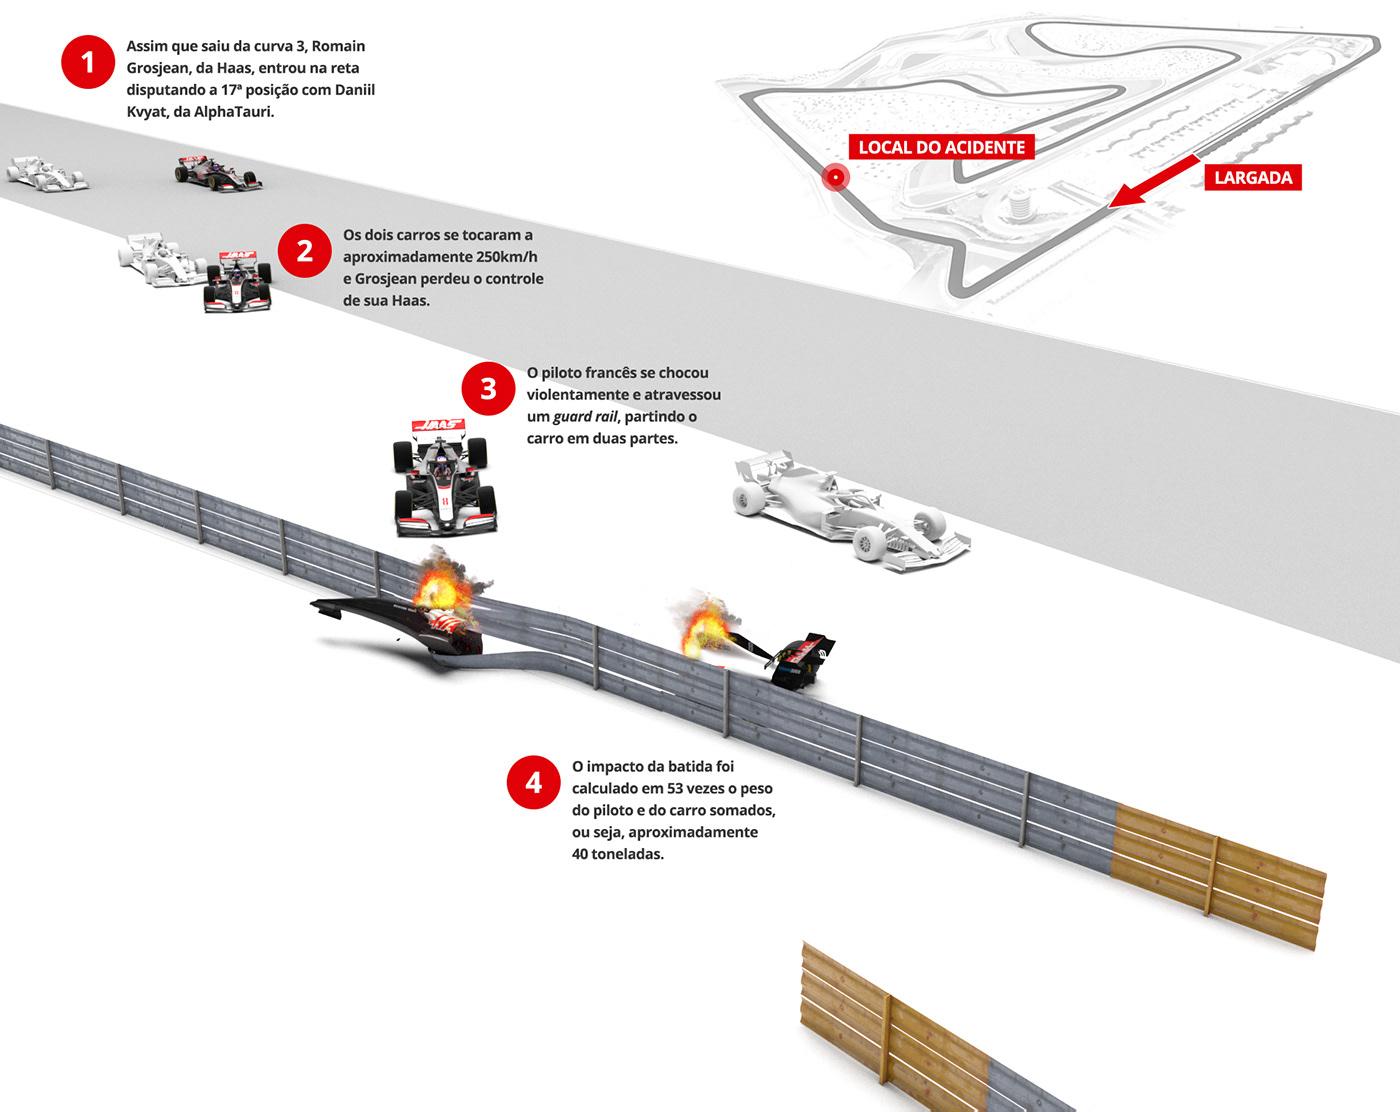 f1 Formula 1 grosjean accident infográfico